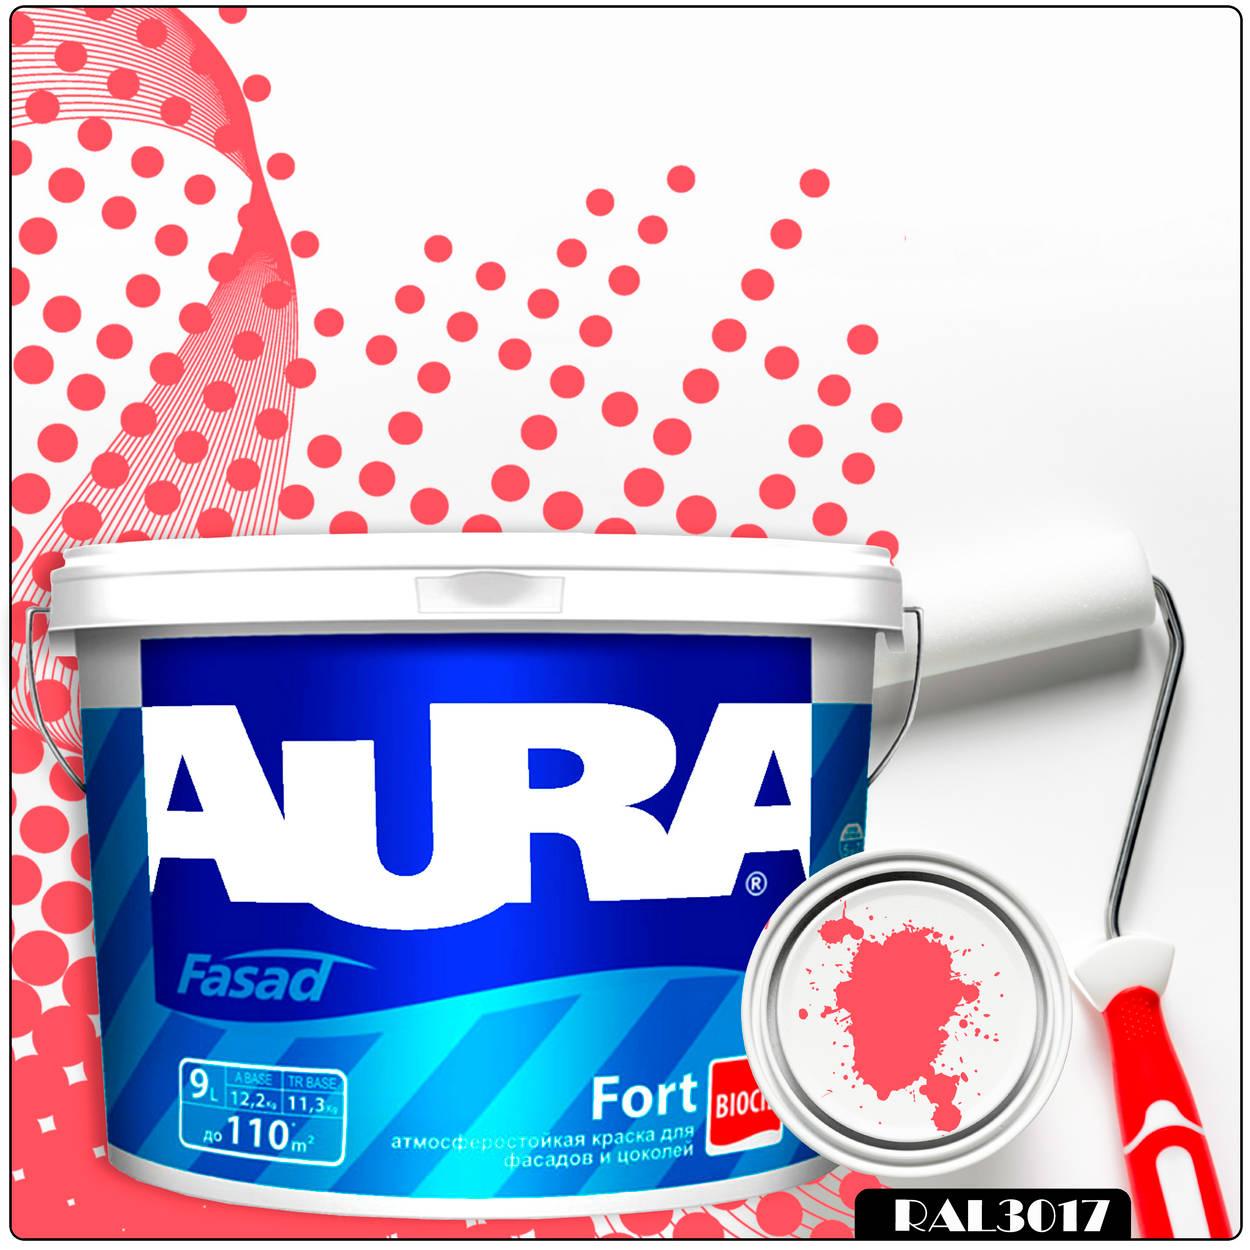 Фото 15 - Краска Aura Fasad Fort, RAL 3017 Розовый, латексная, матовая, для фасада и цоколей, 9л, Аура.